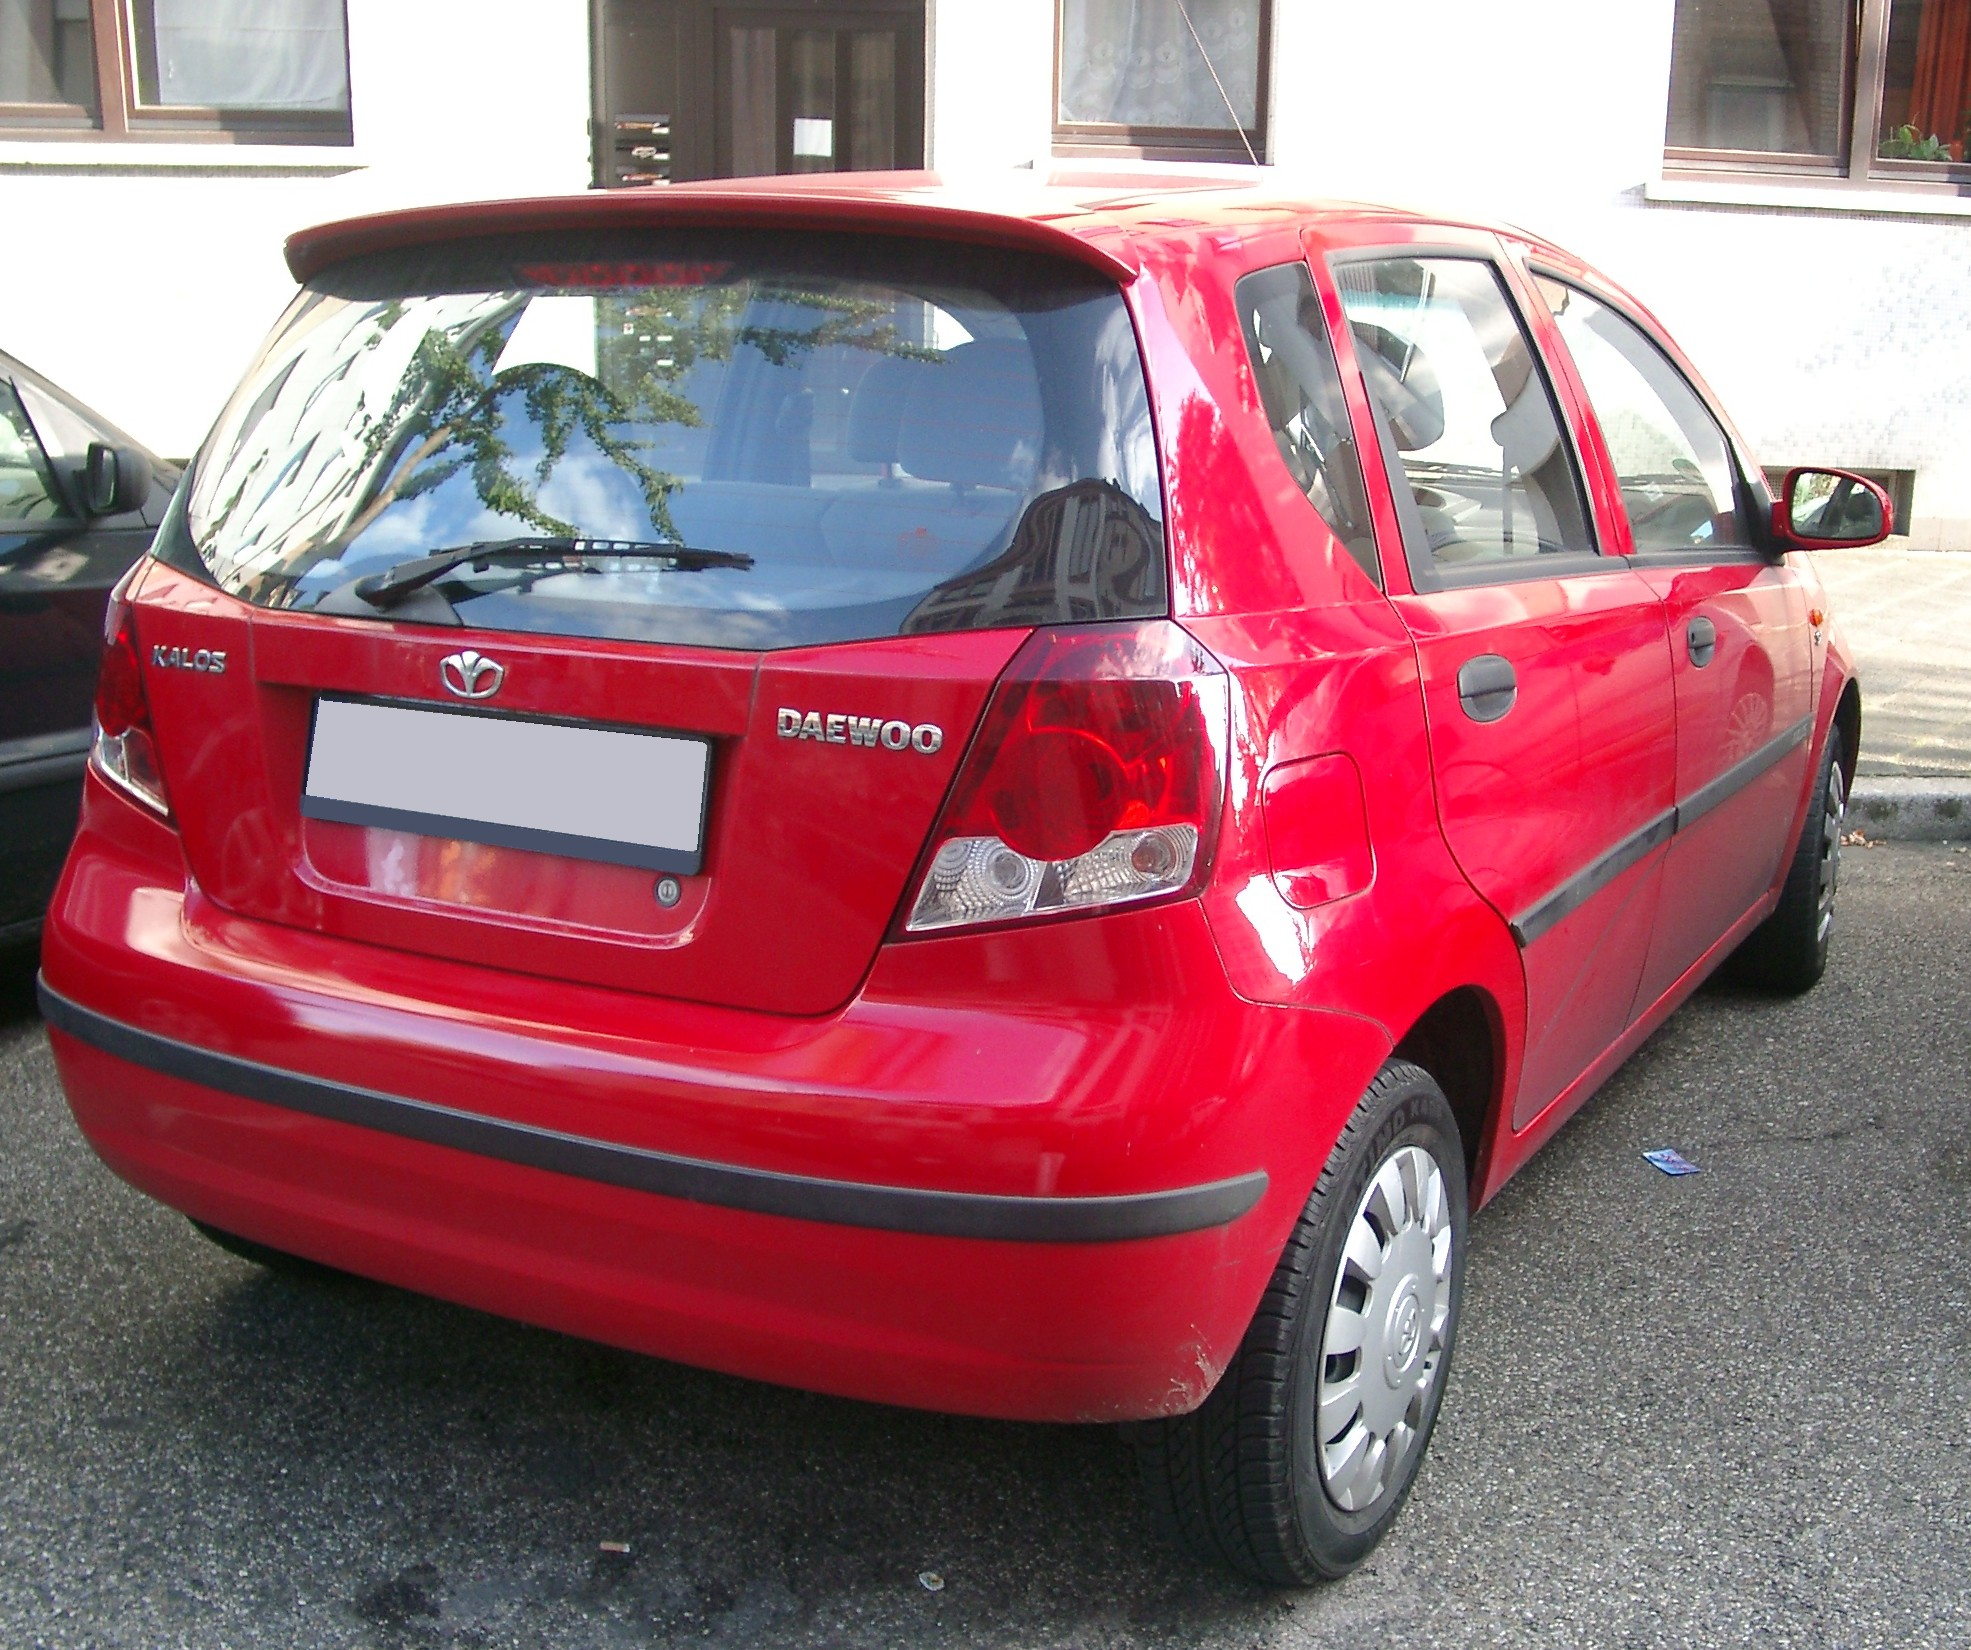 File:Daewoo Kalos rear 20070913.jpg